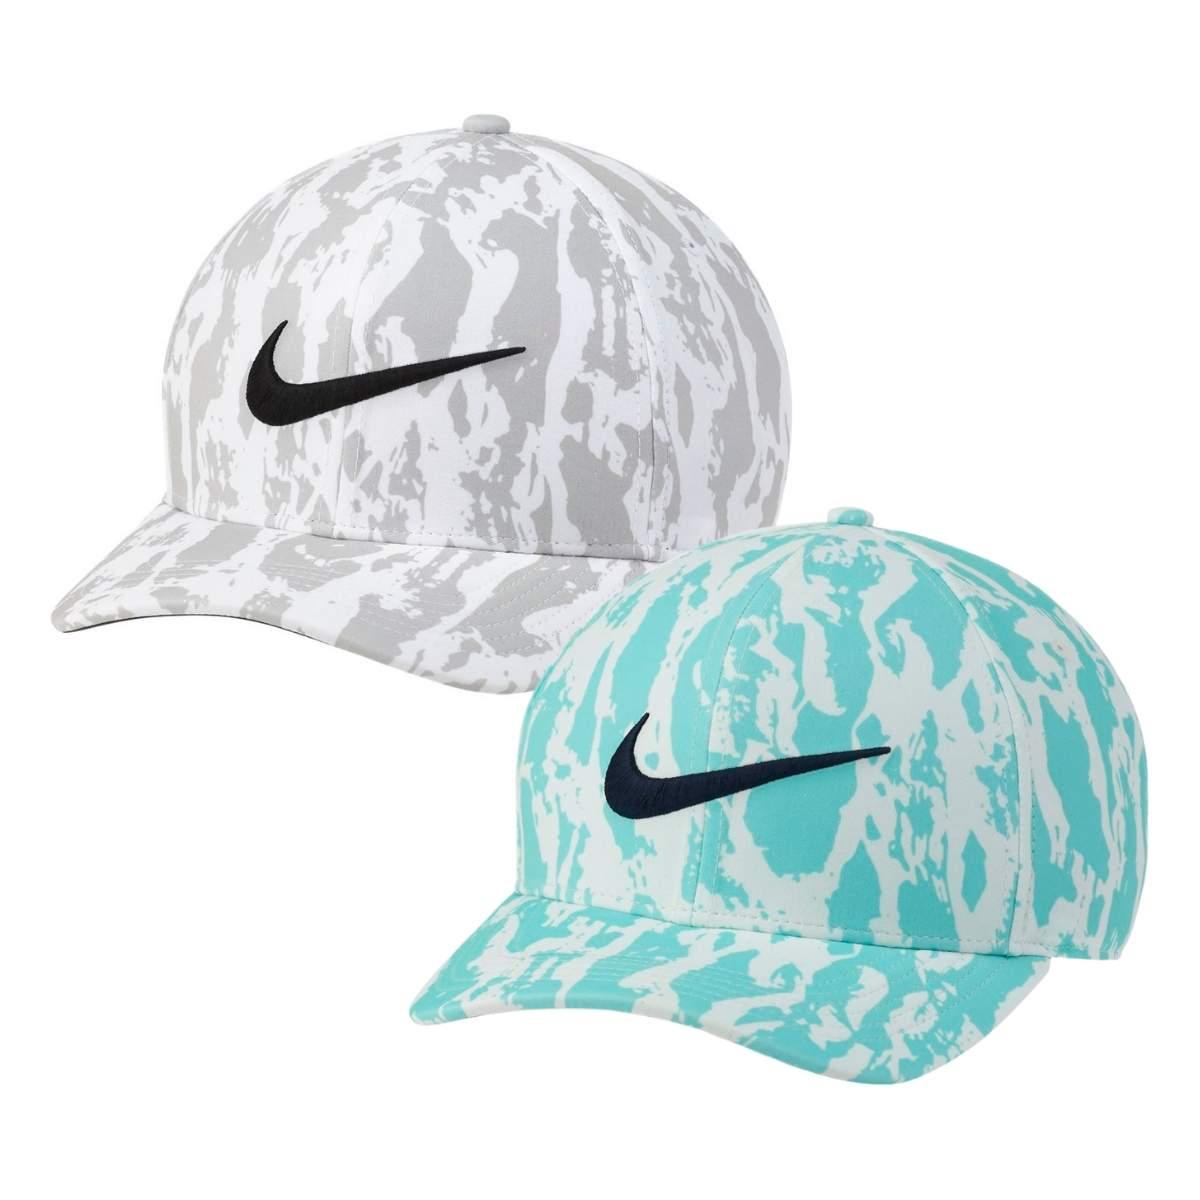 Nike Men's 2021 AeroBill Classic99 Printed Hat